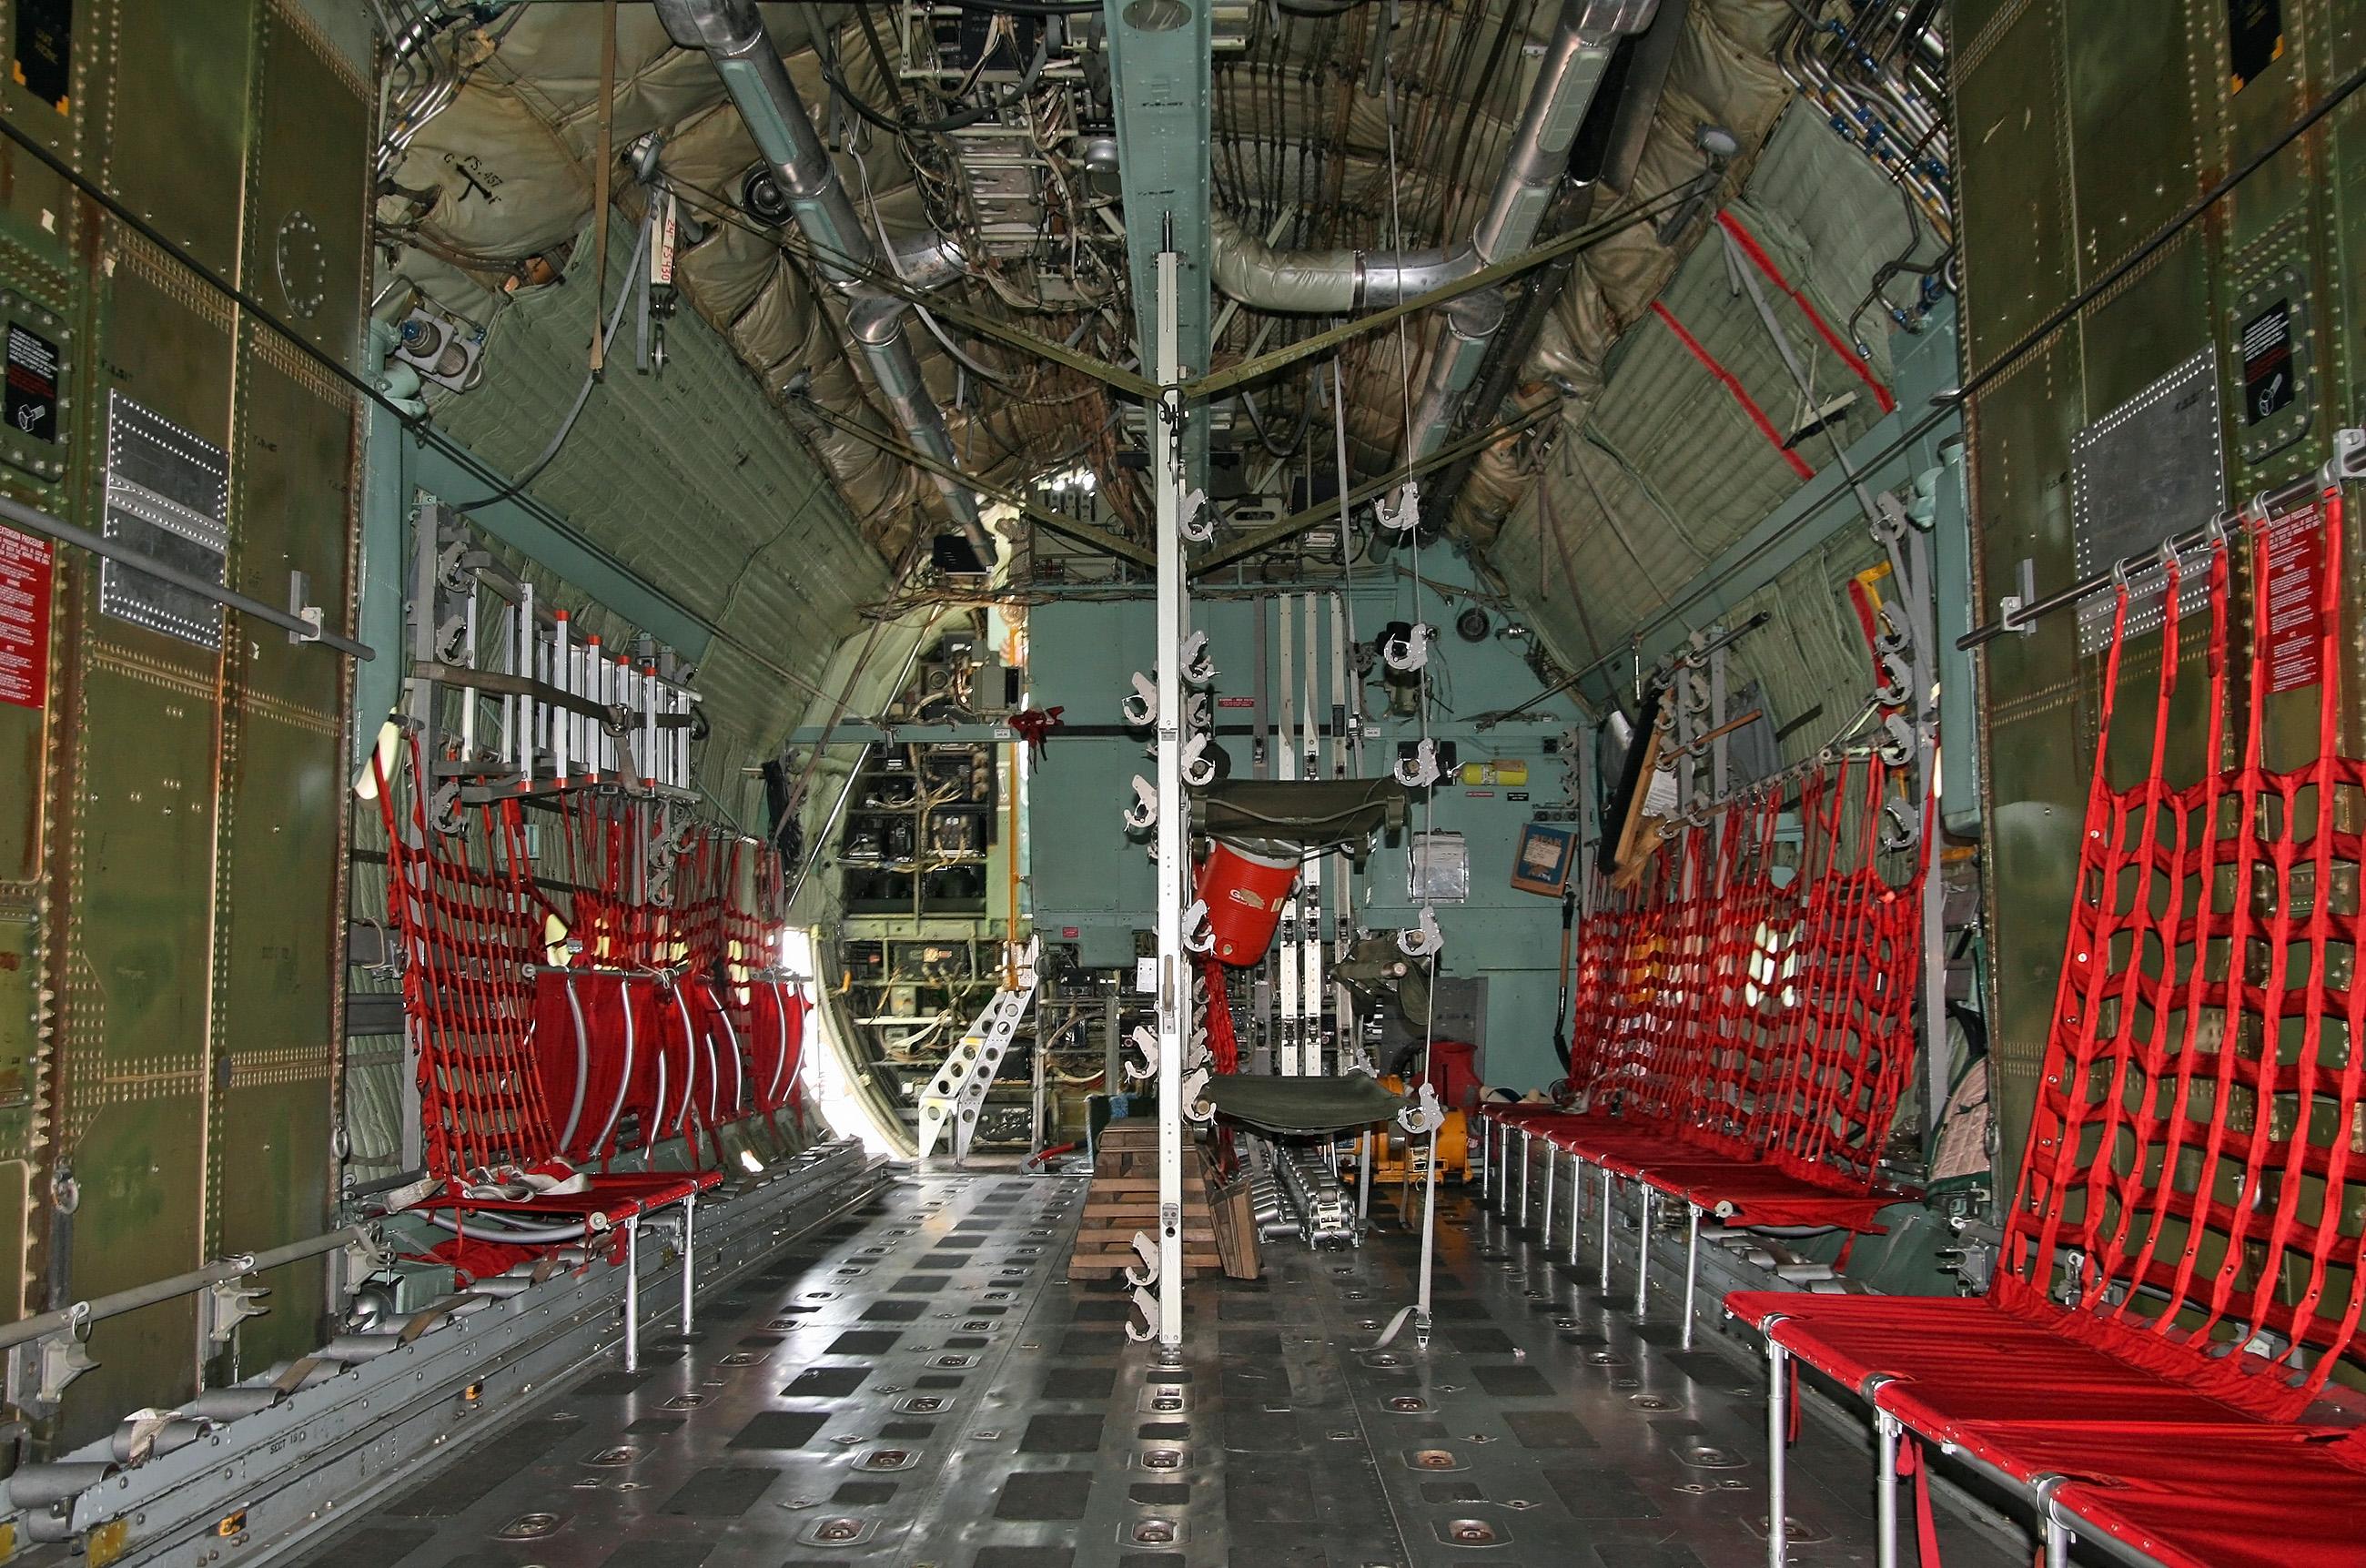 Military Cargo Plane Inside | www.imgkid.com - The Image ...